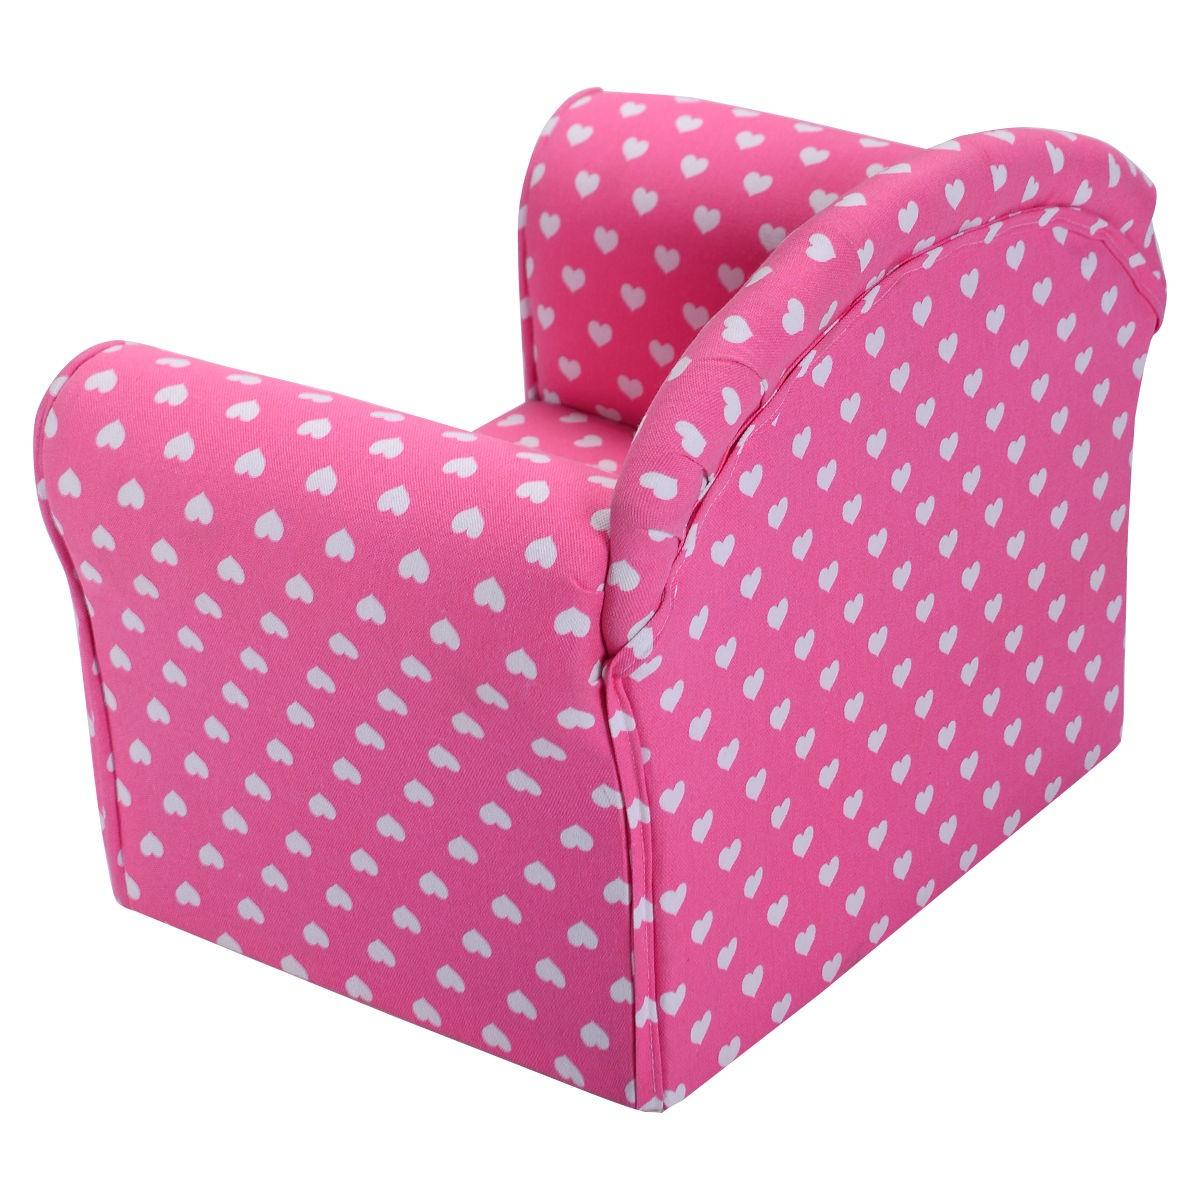 Kid Living Room Furniture Kids Baby Sofa Armrest Chair Couch Children Living Room Toddler